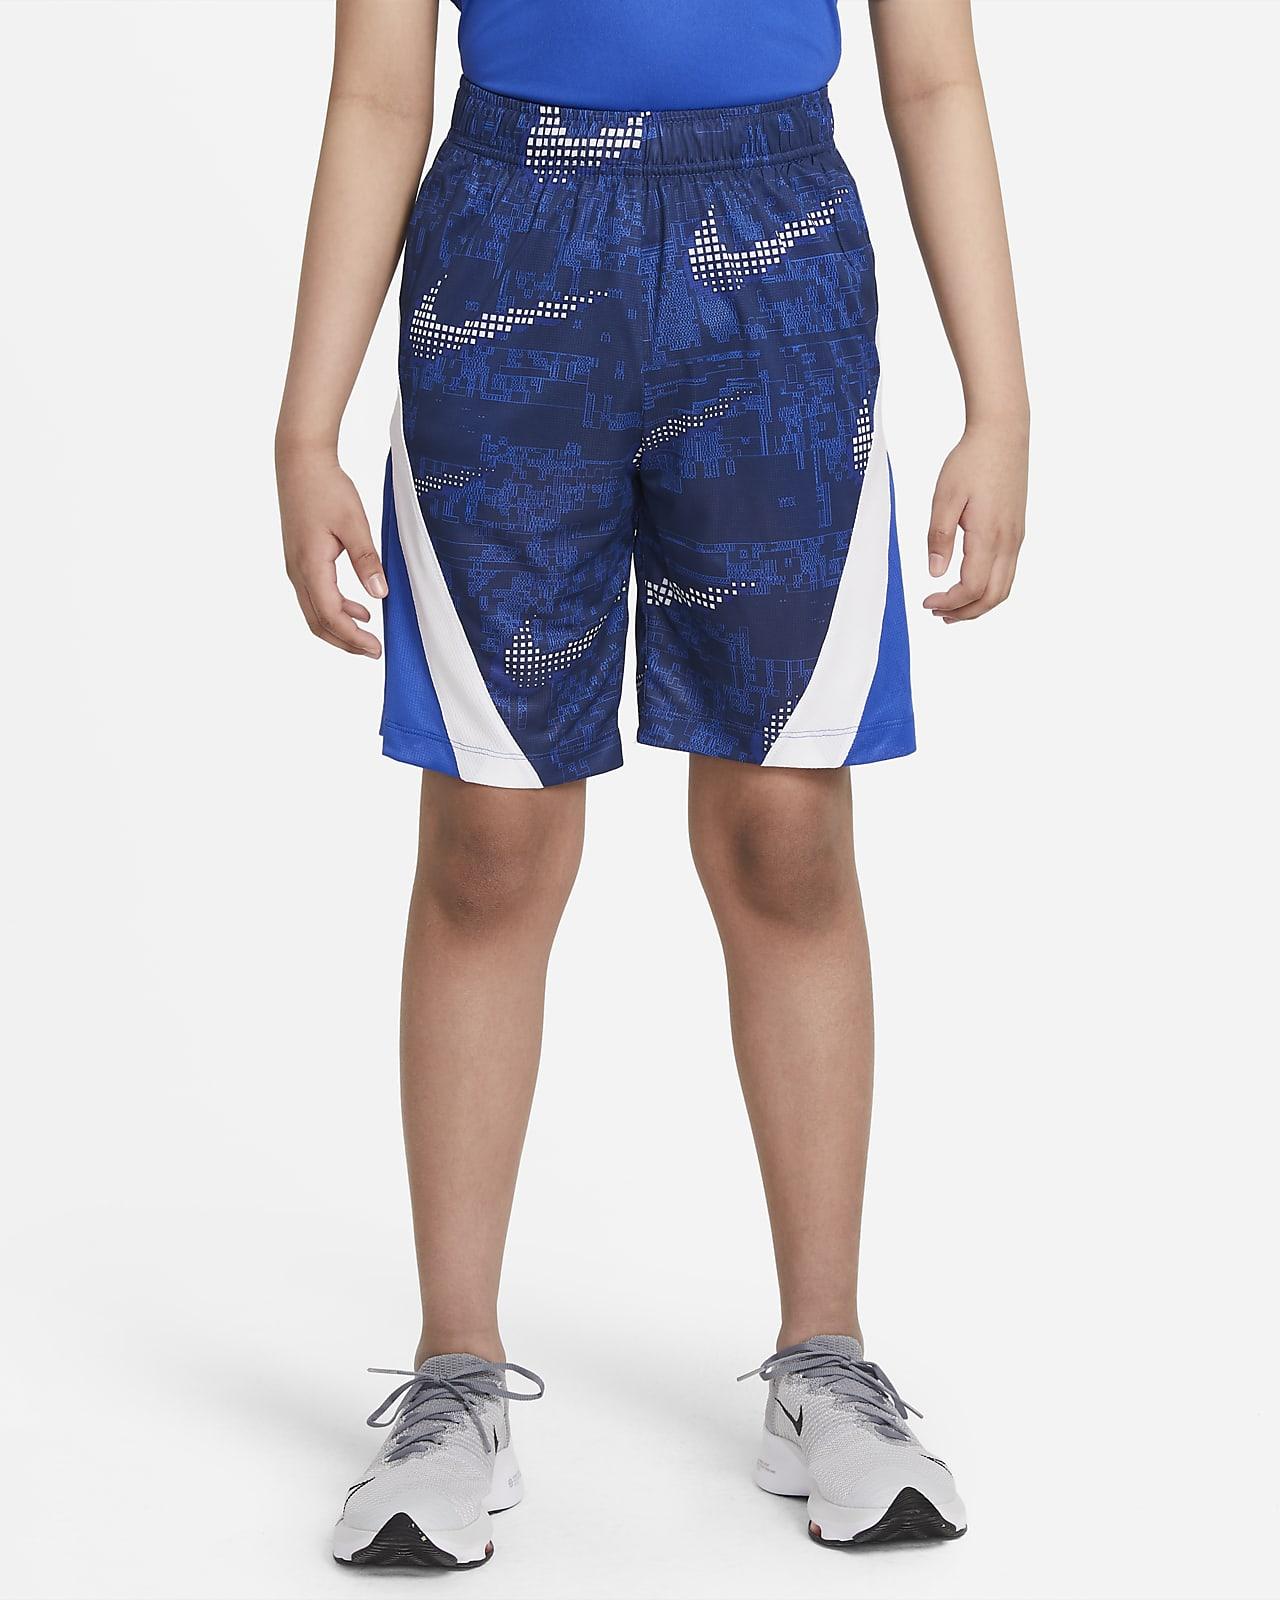 Nike Dominate 大童 (男童) 印花訓練短褲